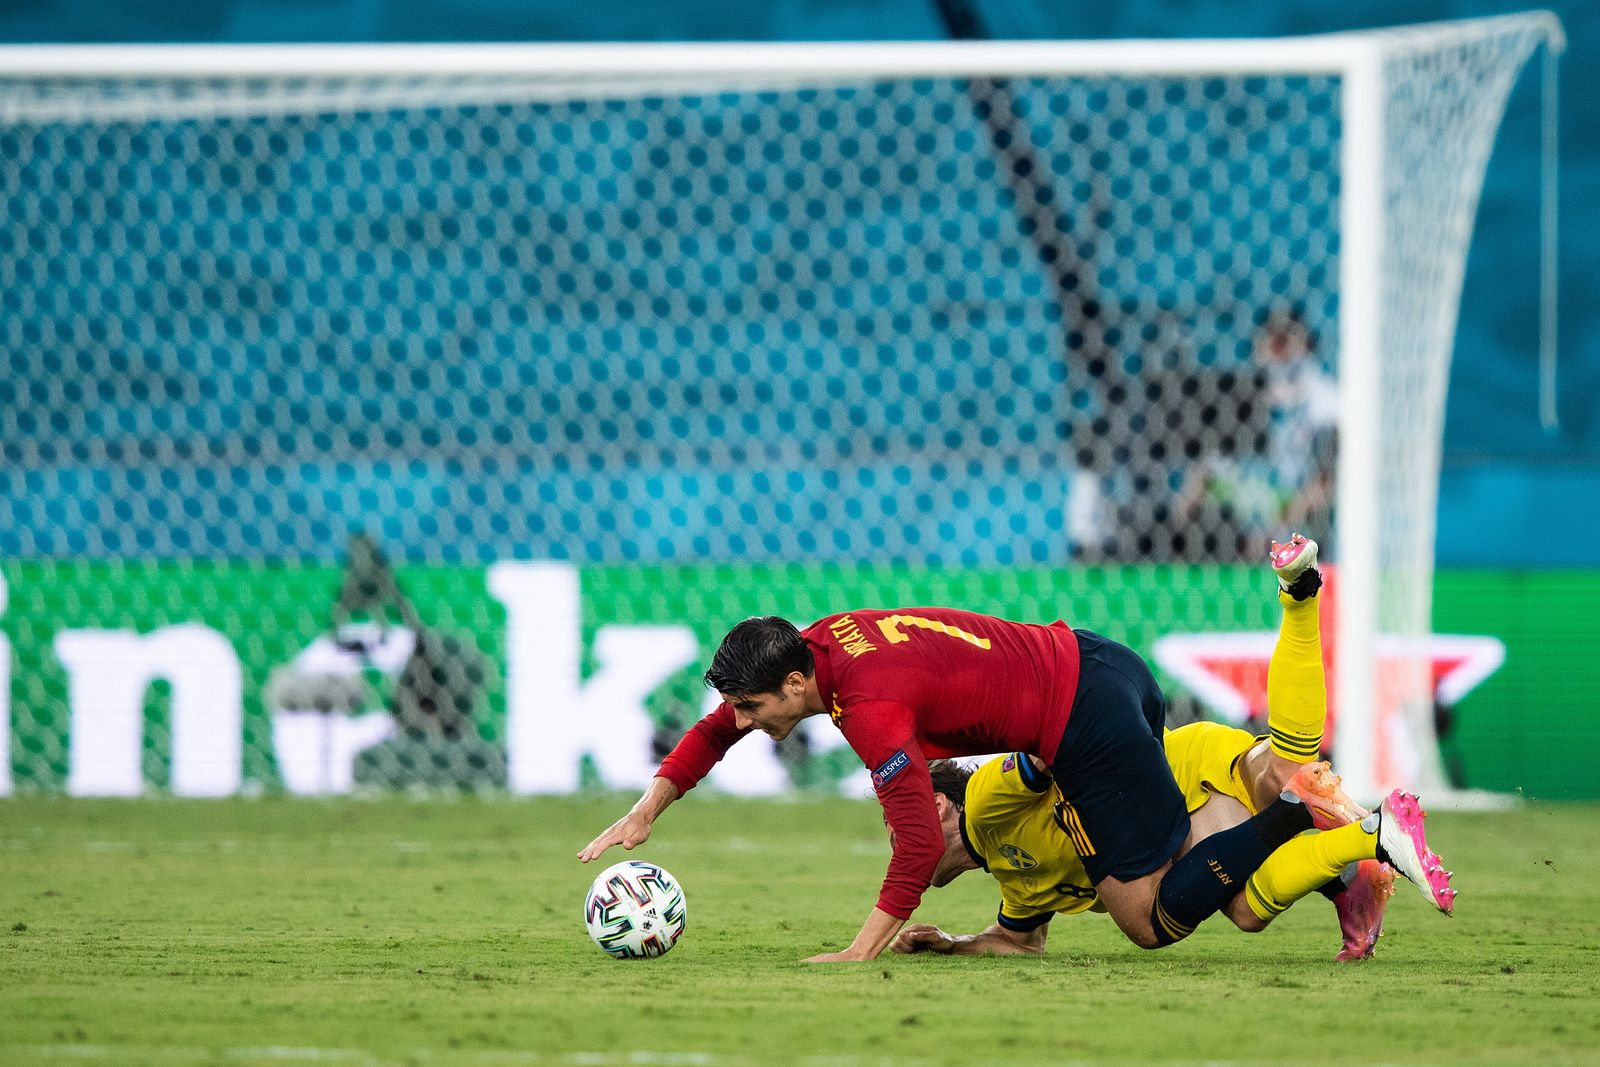 210614 Alvaro Morata Ãlvaro Morata of Spain and Albin Ekdal of Sweden during the UEFA EURO, EM, Europameisterschaft,Fu